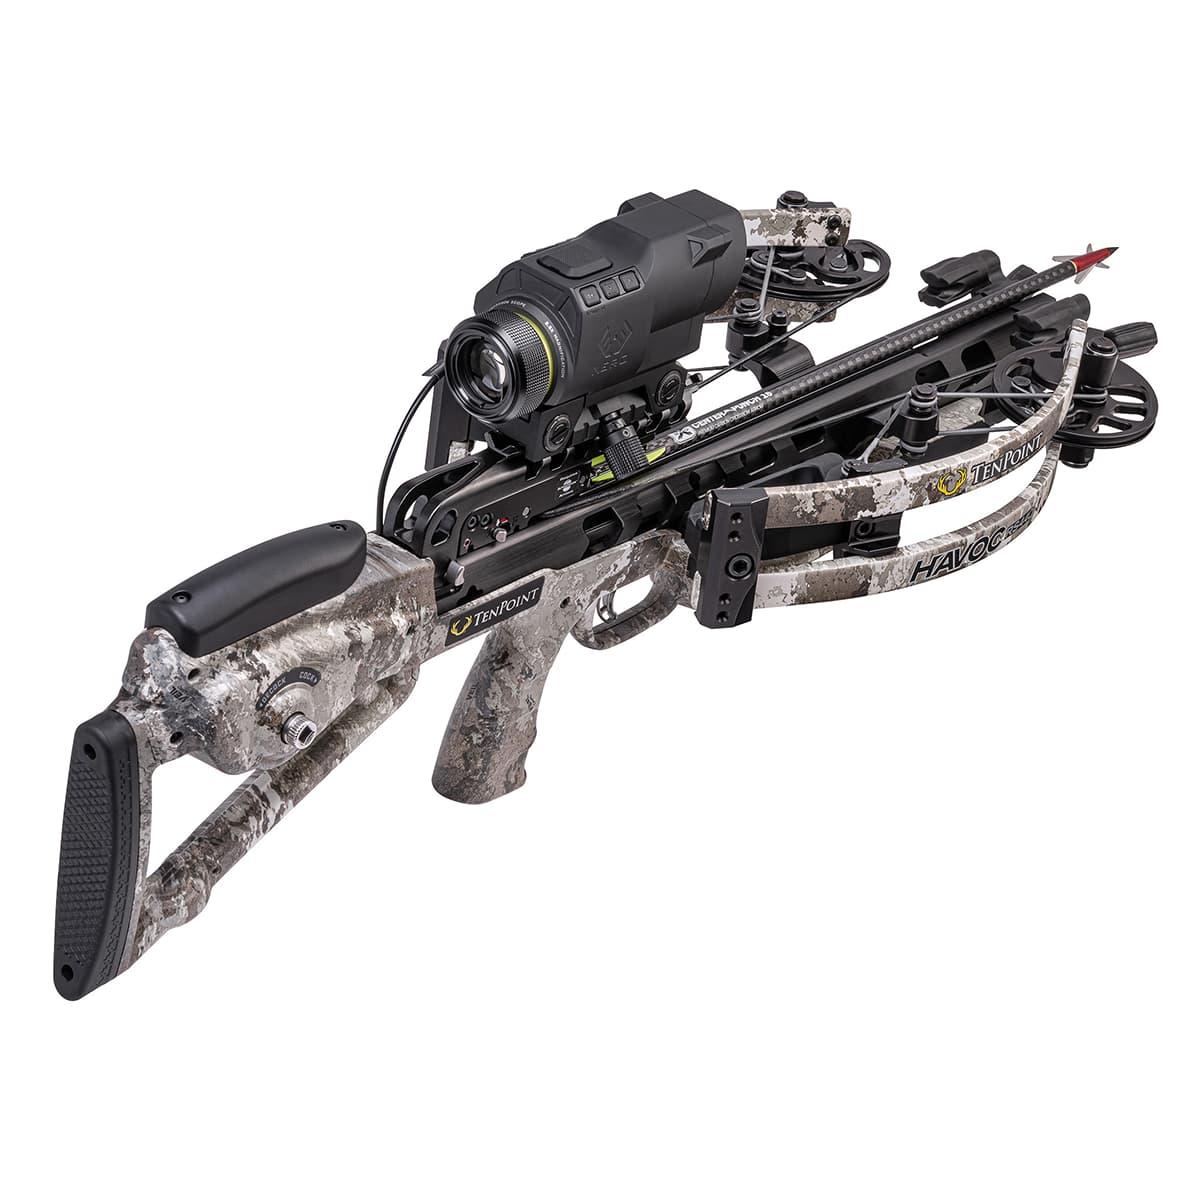 TenPoint Havoc RS440 Crossbow with Garmin Xero Scope